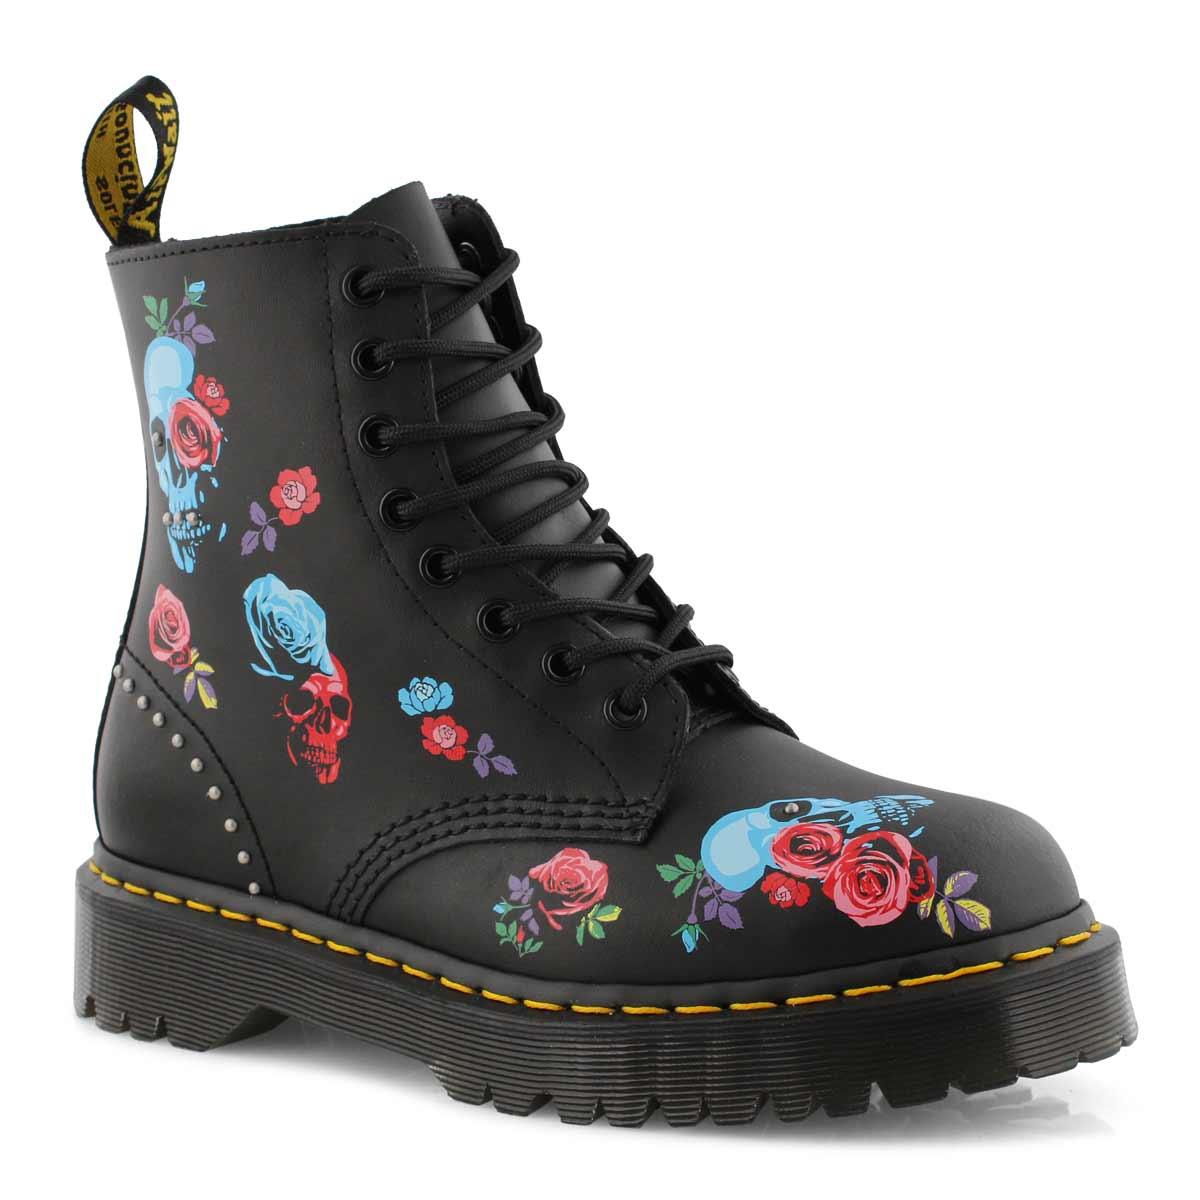 Lds 1460 Bex Rose black 8 eye boot